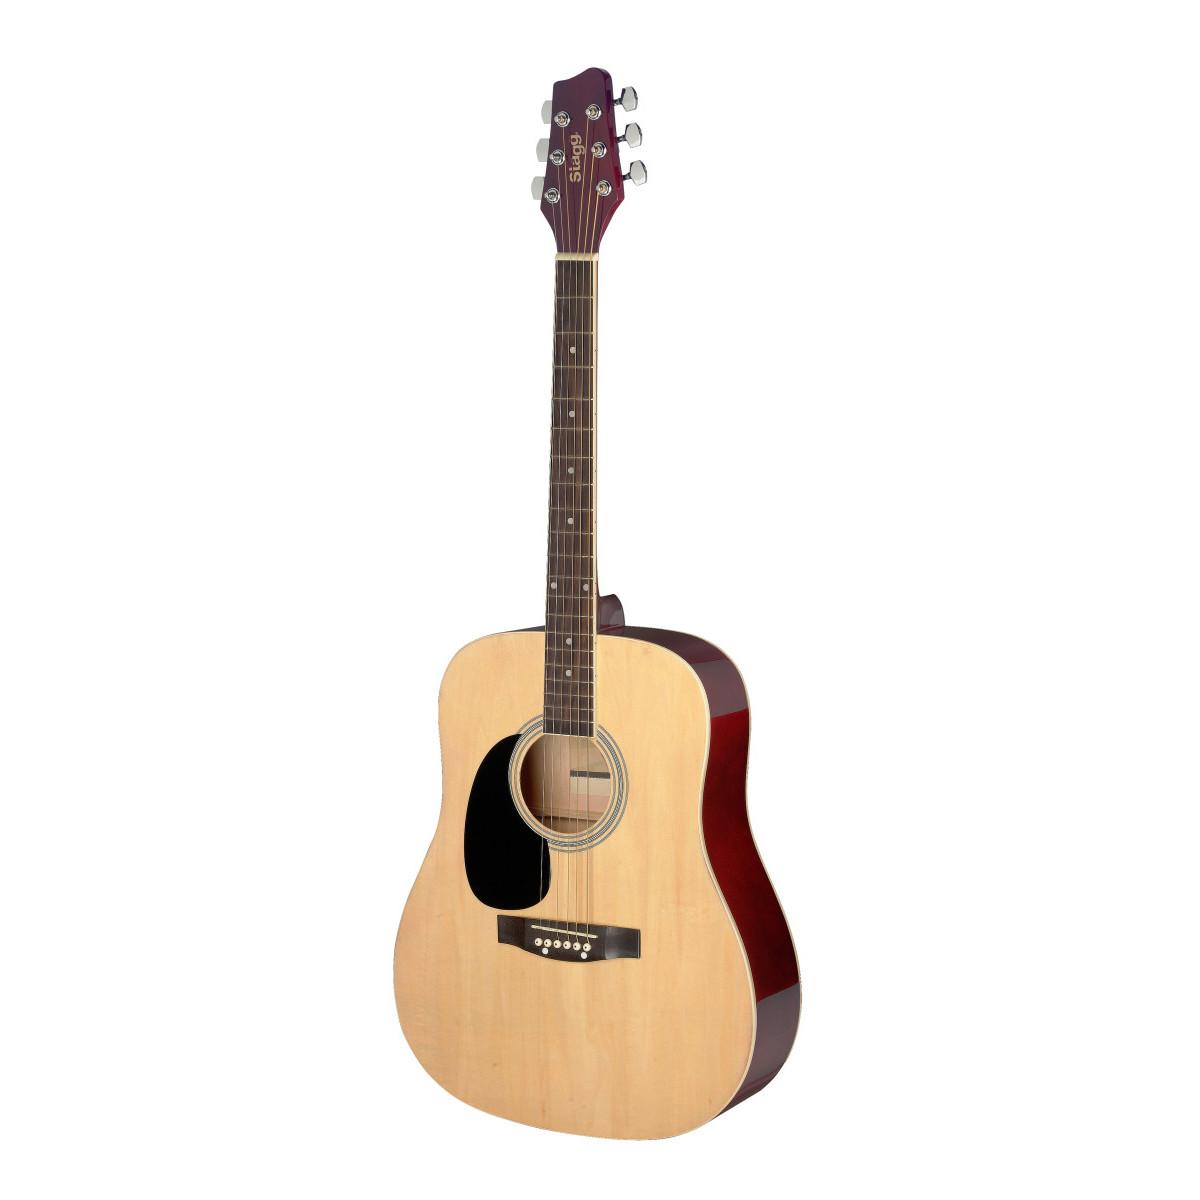 Guitare Gaucher enfant 3/4 folk naturel